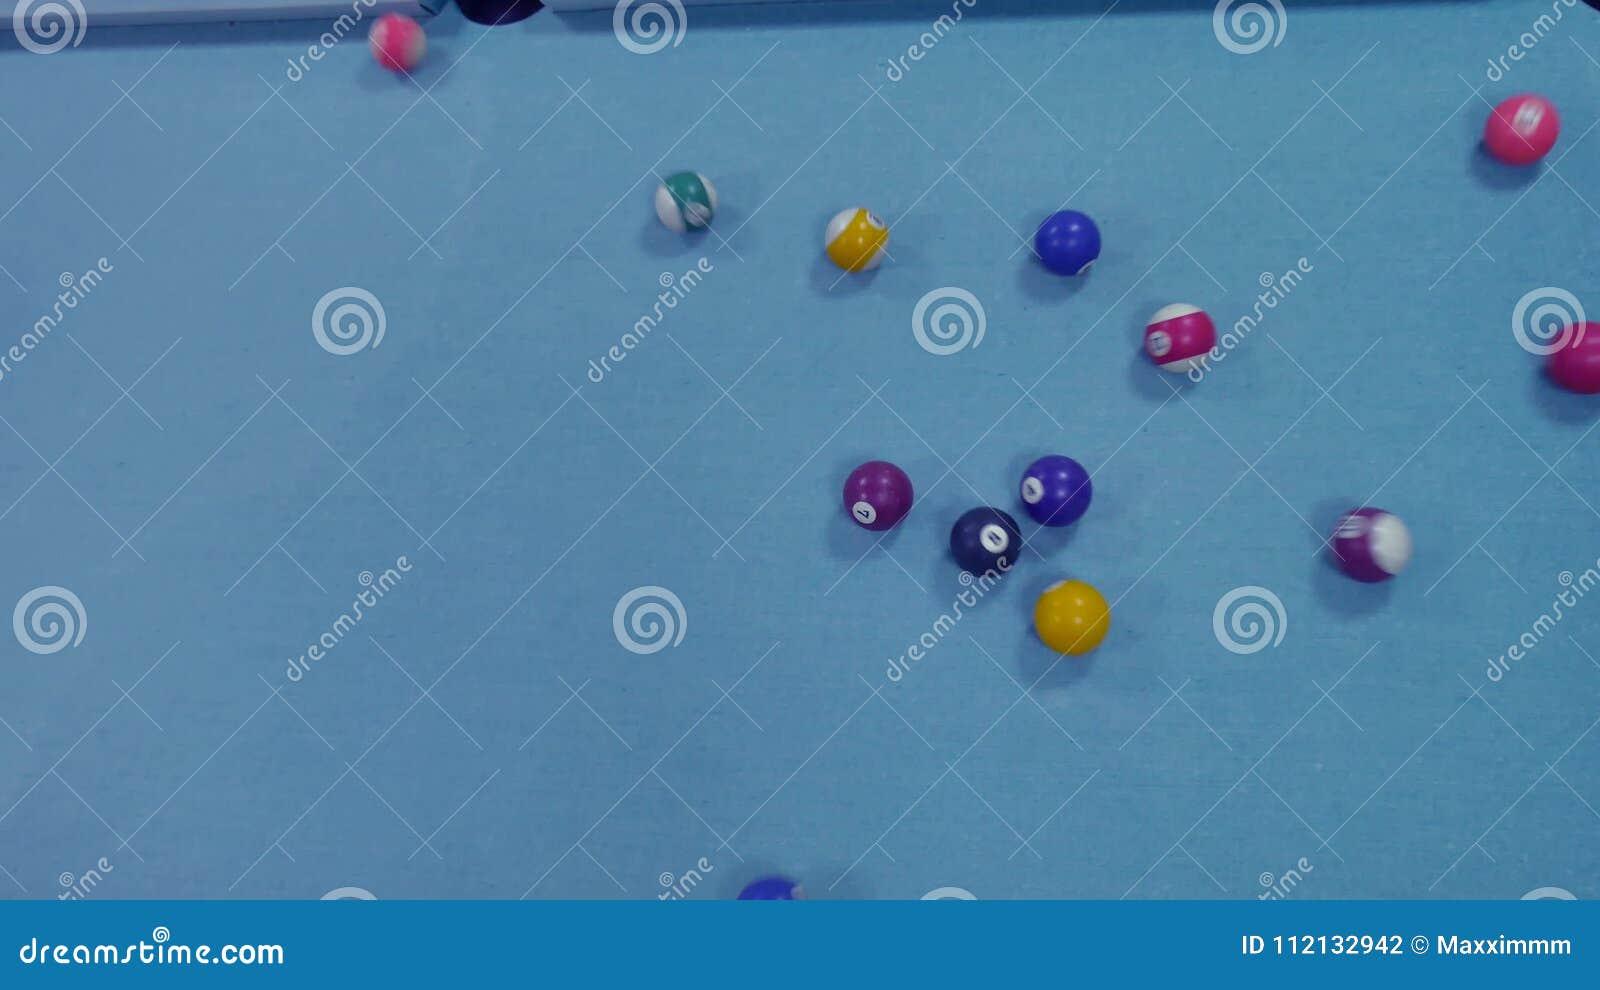 American Billiards Pool On A Table Breakdown Of A Pyramid - Pool table breakdown